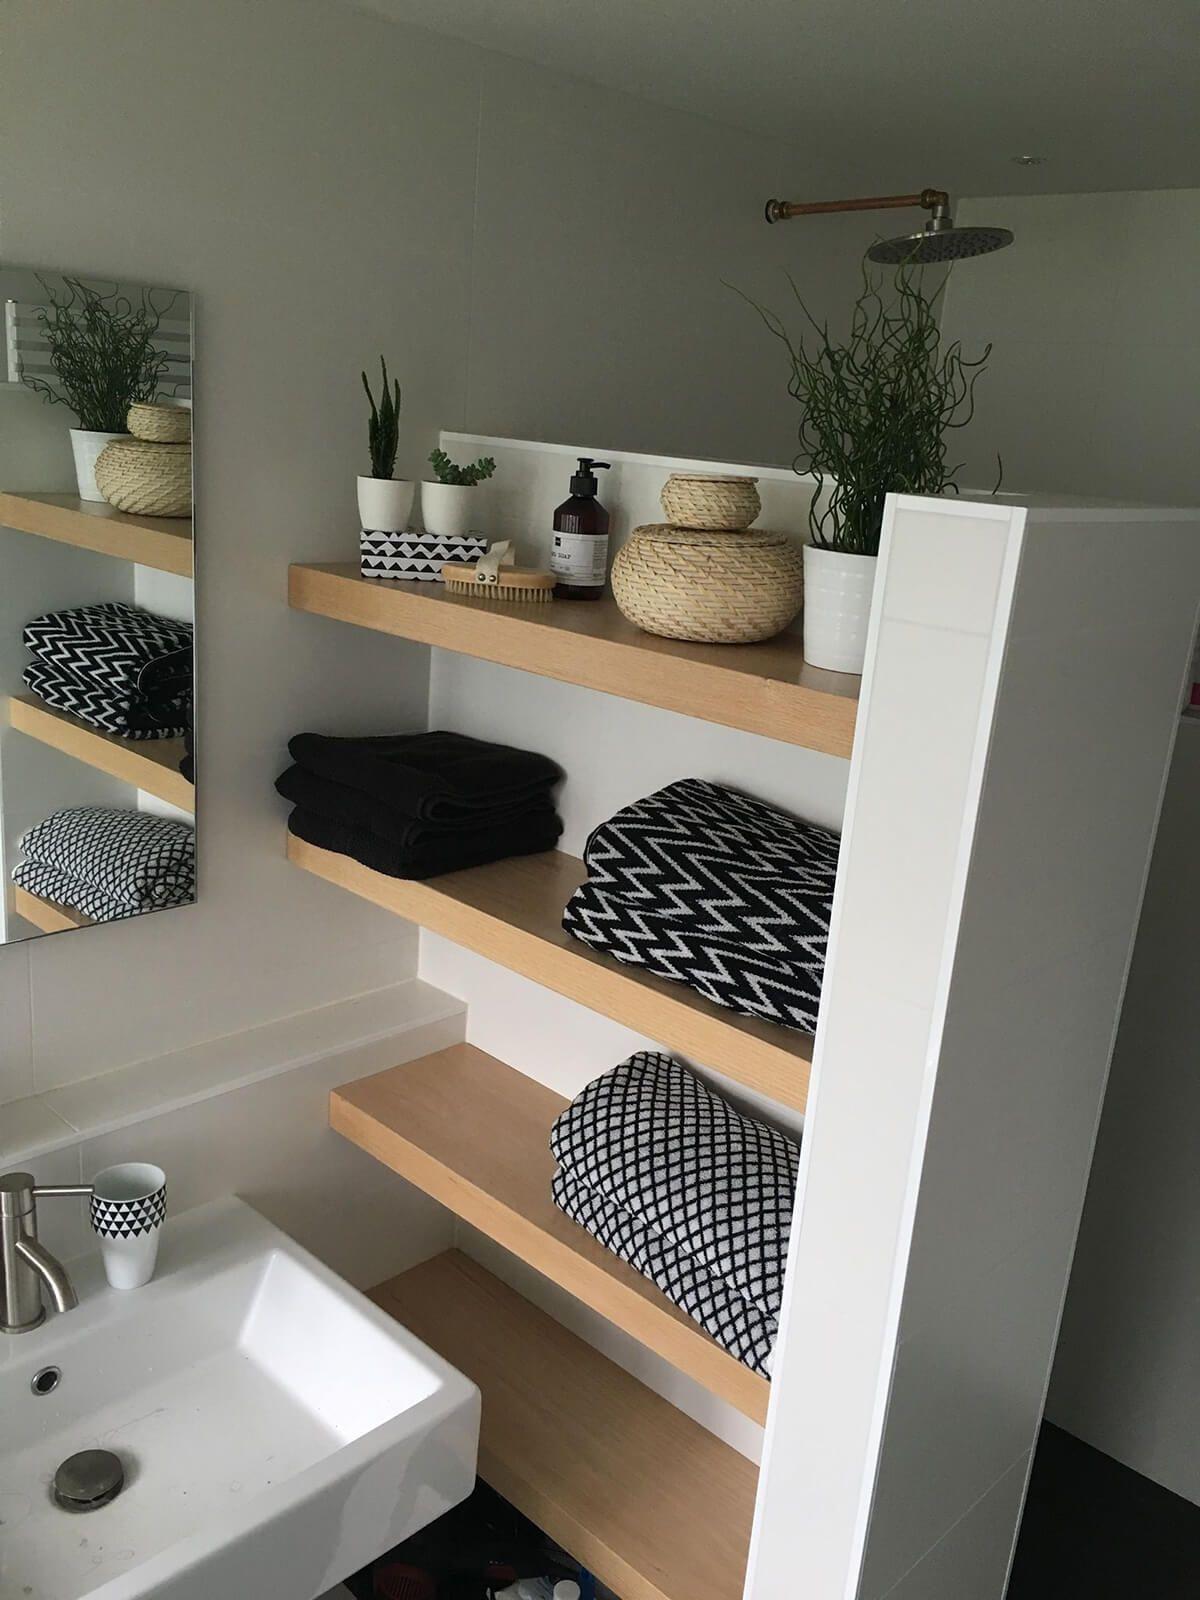 25 Brilliant Built In Bathroom Shelf And Storage Ideas To Keep You Organized With Style Badezimmer Regal Badezimmer Badezimmer Klein